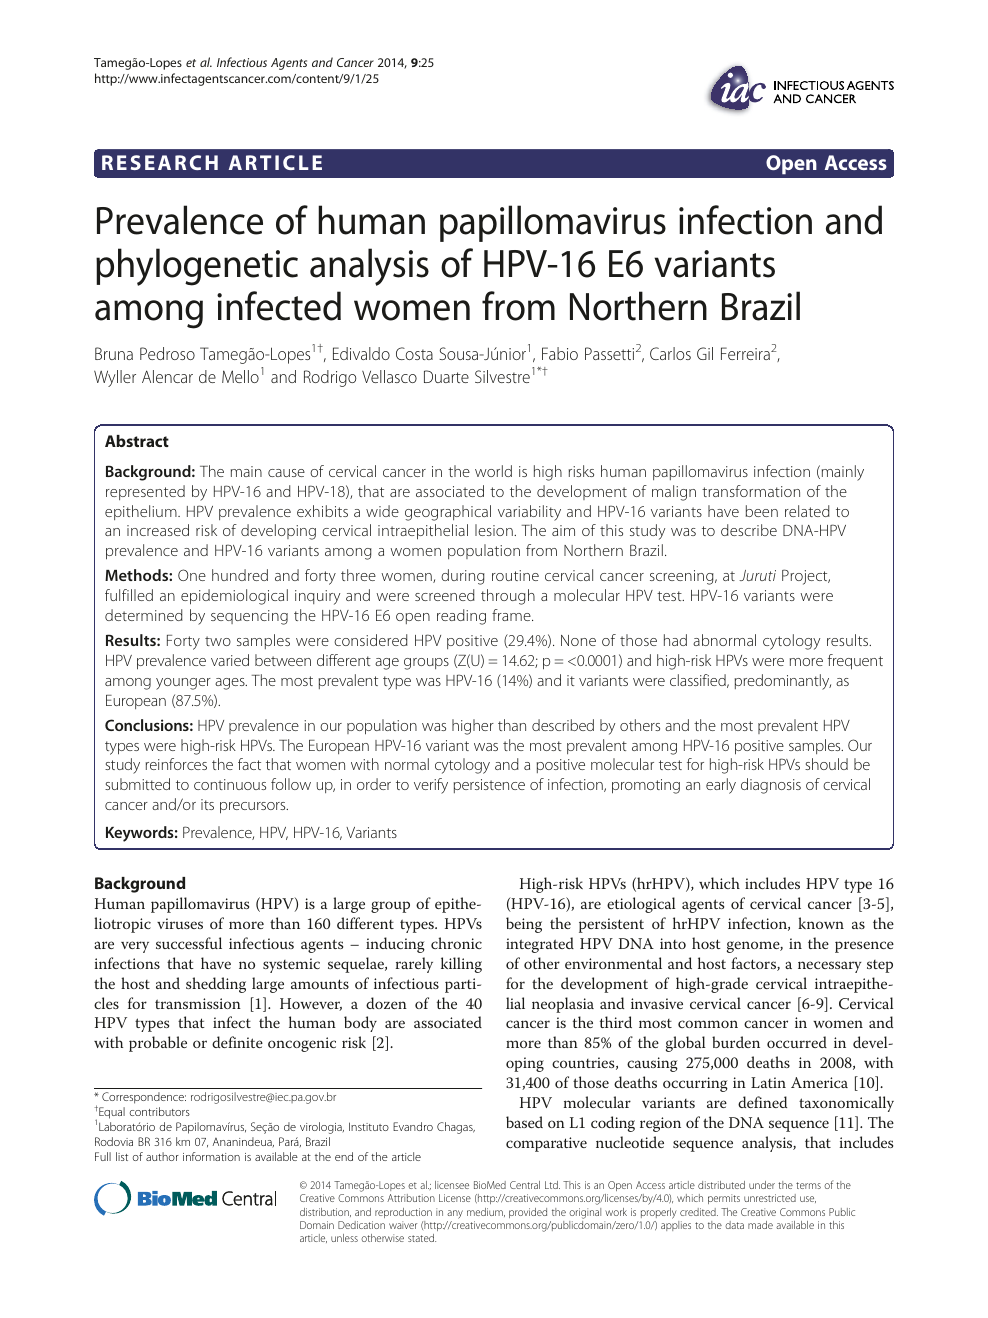 papillomavirus transmissible)